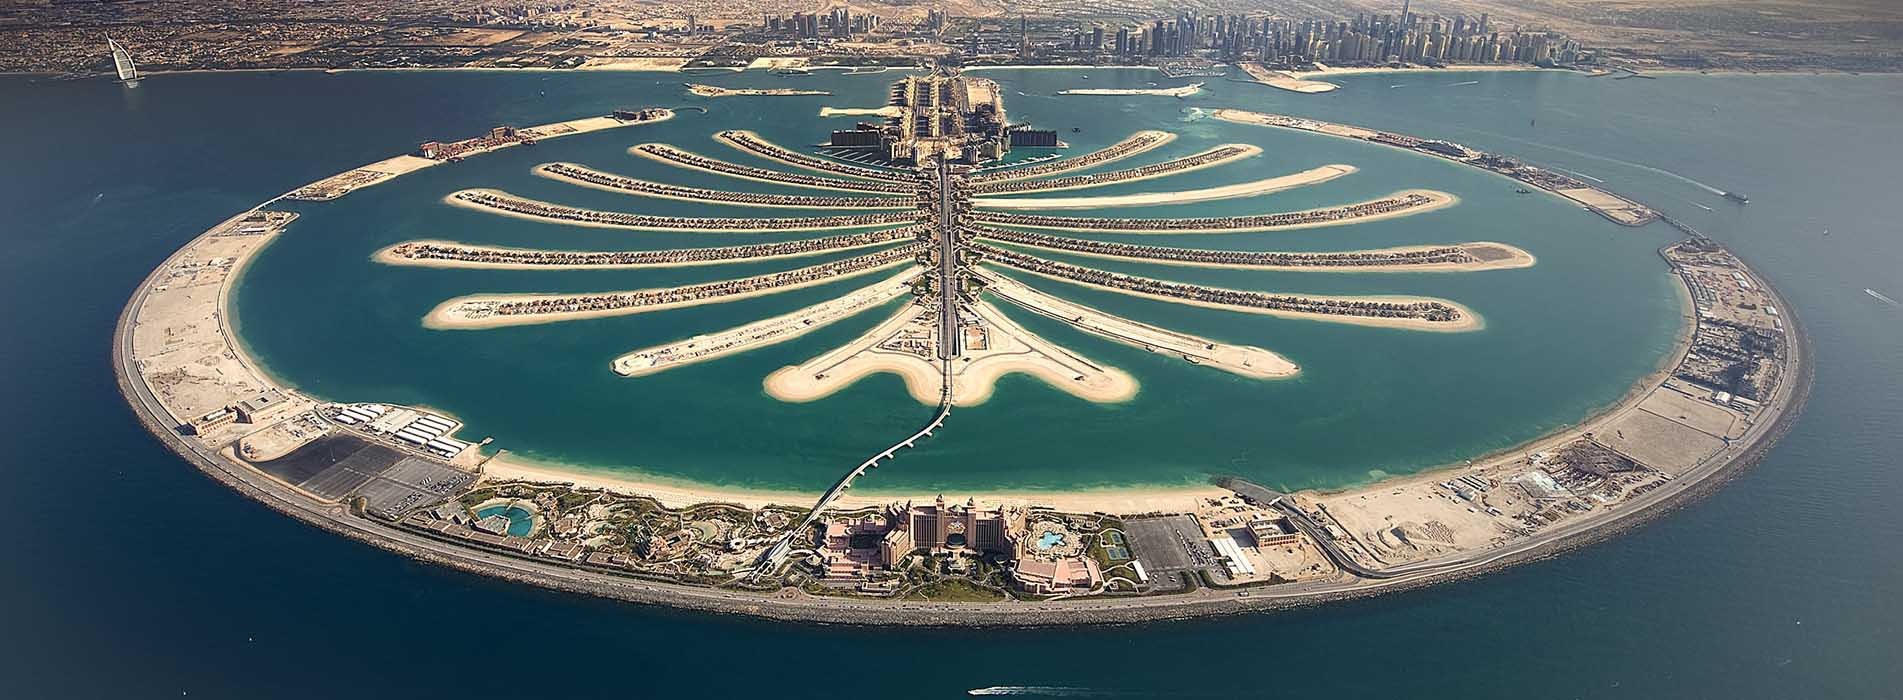 Dubai - Palm Jumeirah 1 (main)